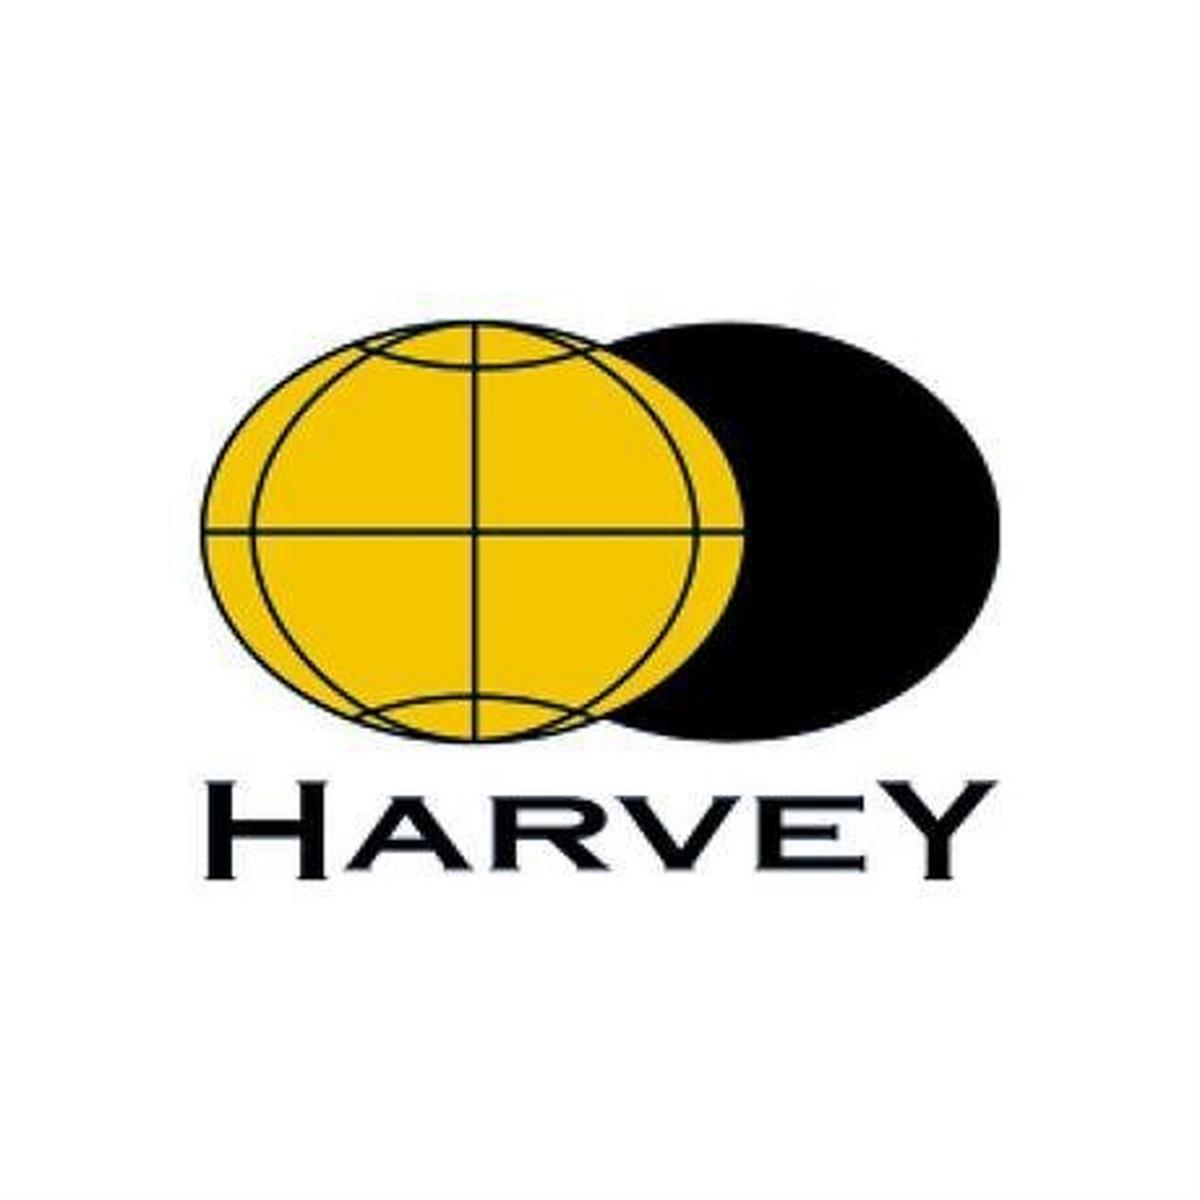 Harveys Harvey Map - XT40: Pennine Way - North